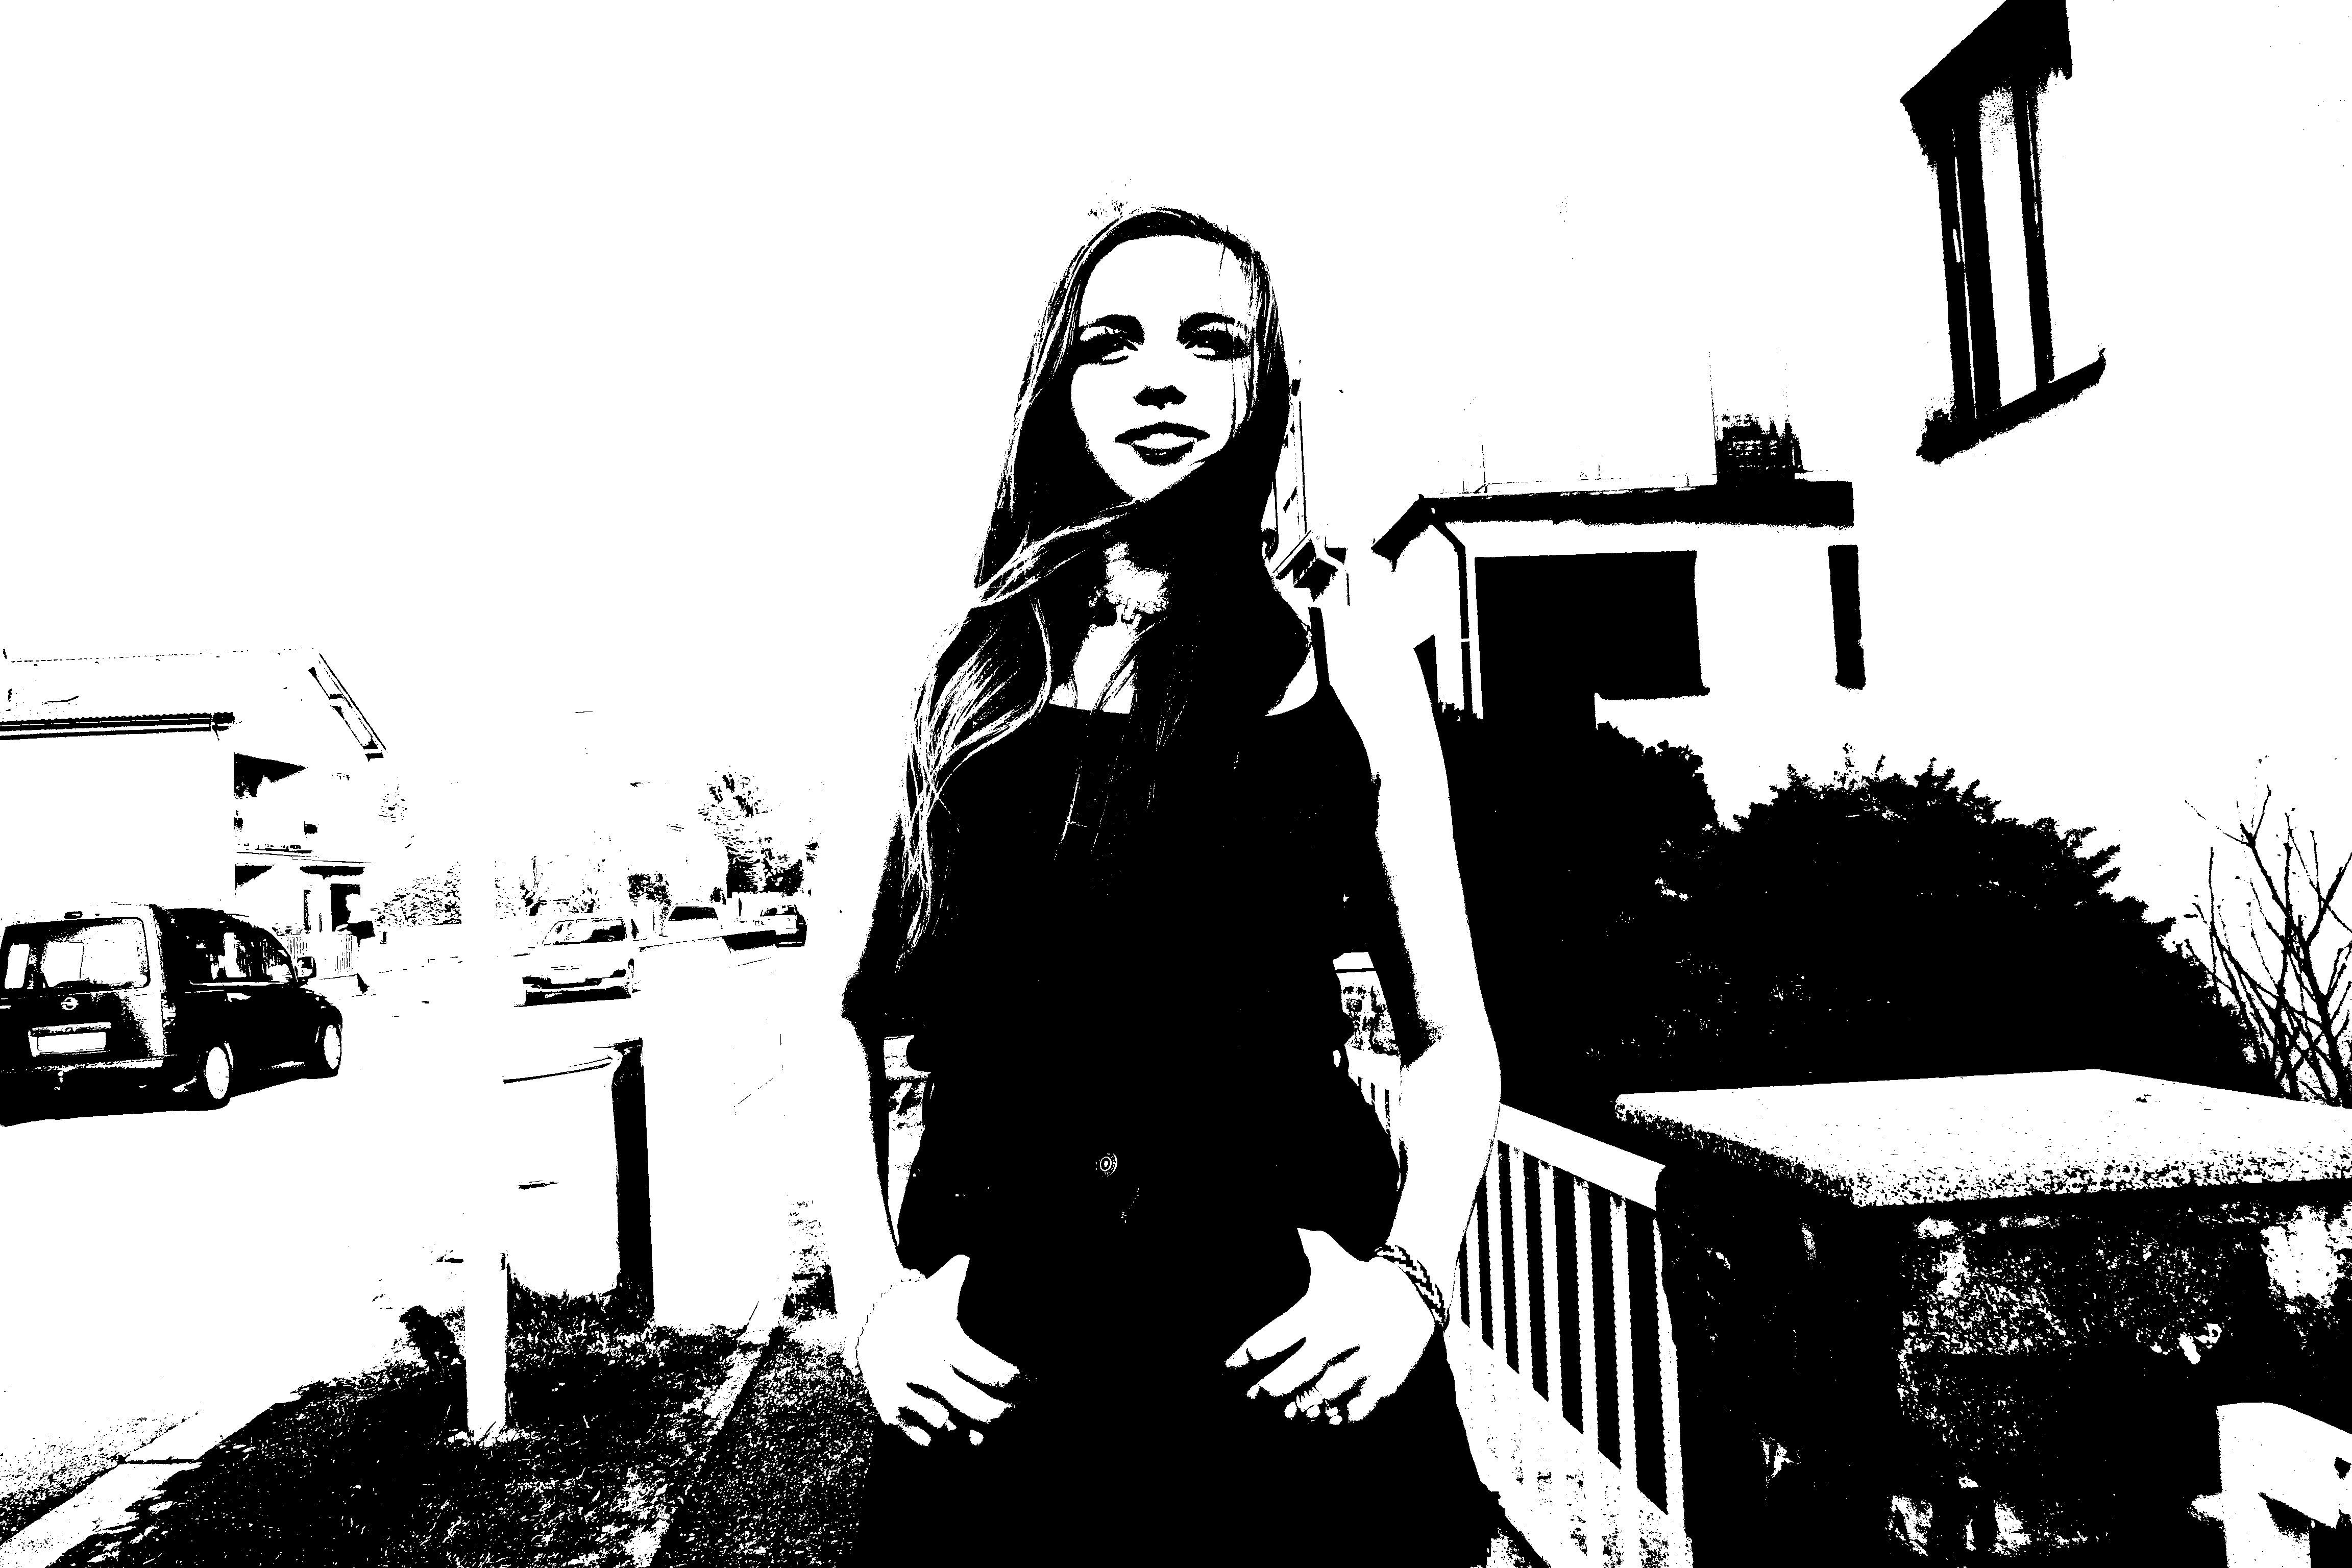 Gambar Hitam Dan Putih Gadis Model Satu Warna Sketsa